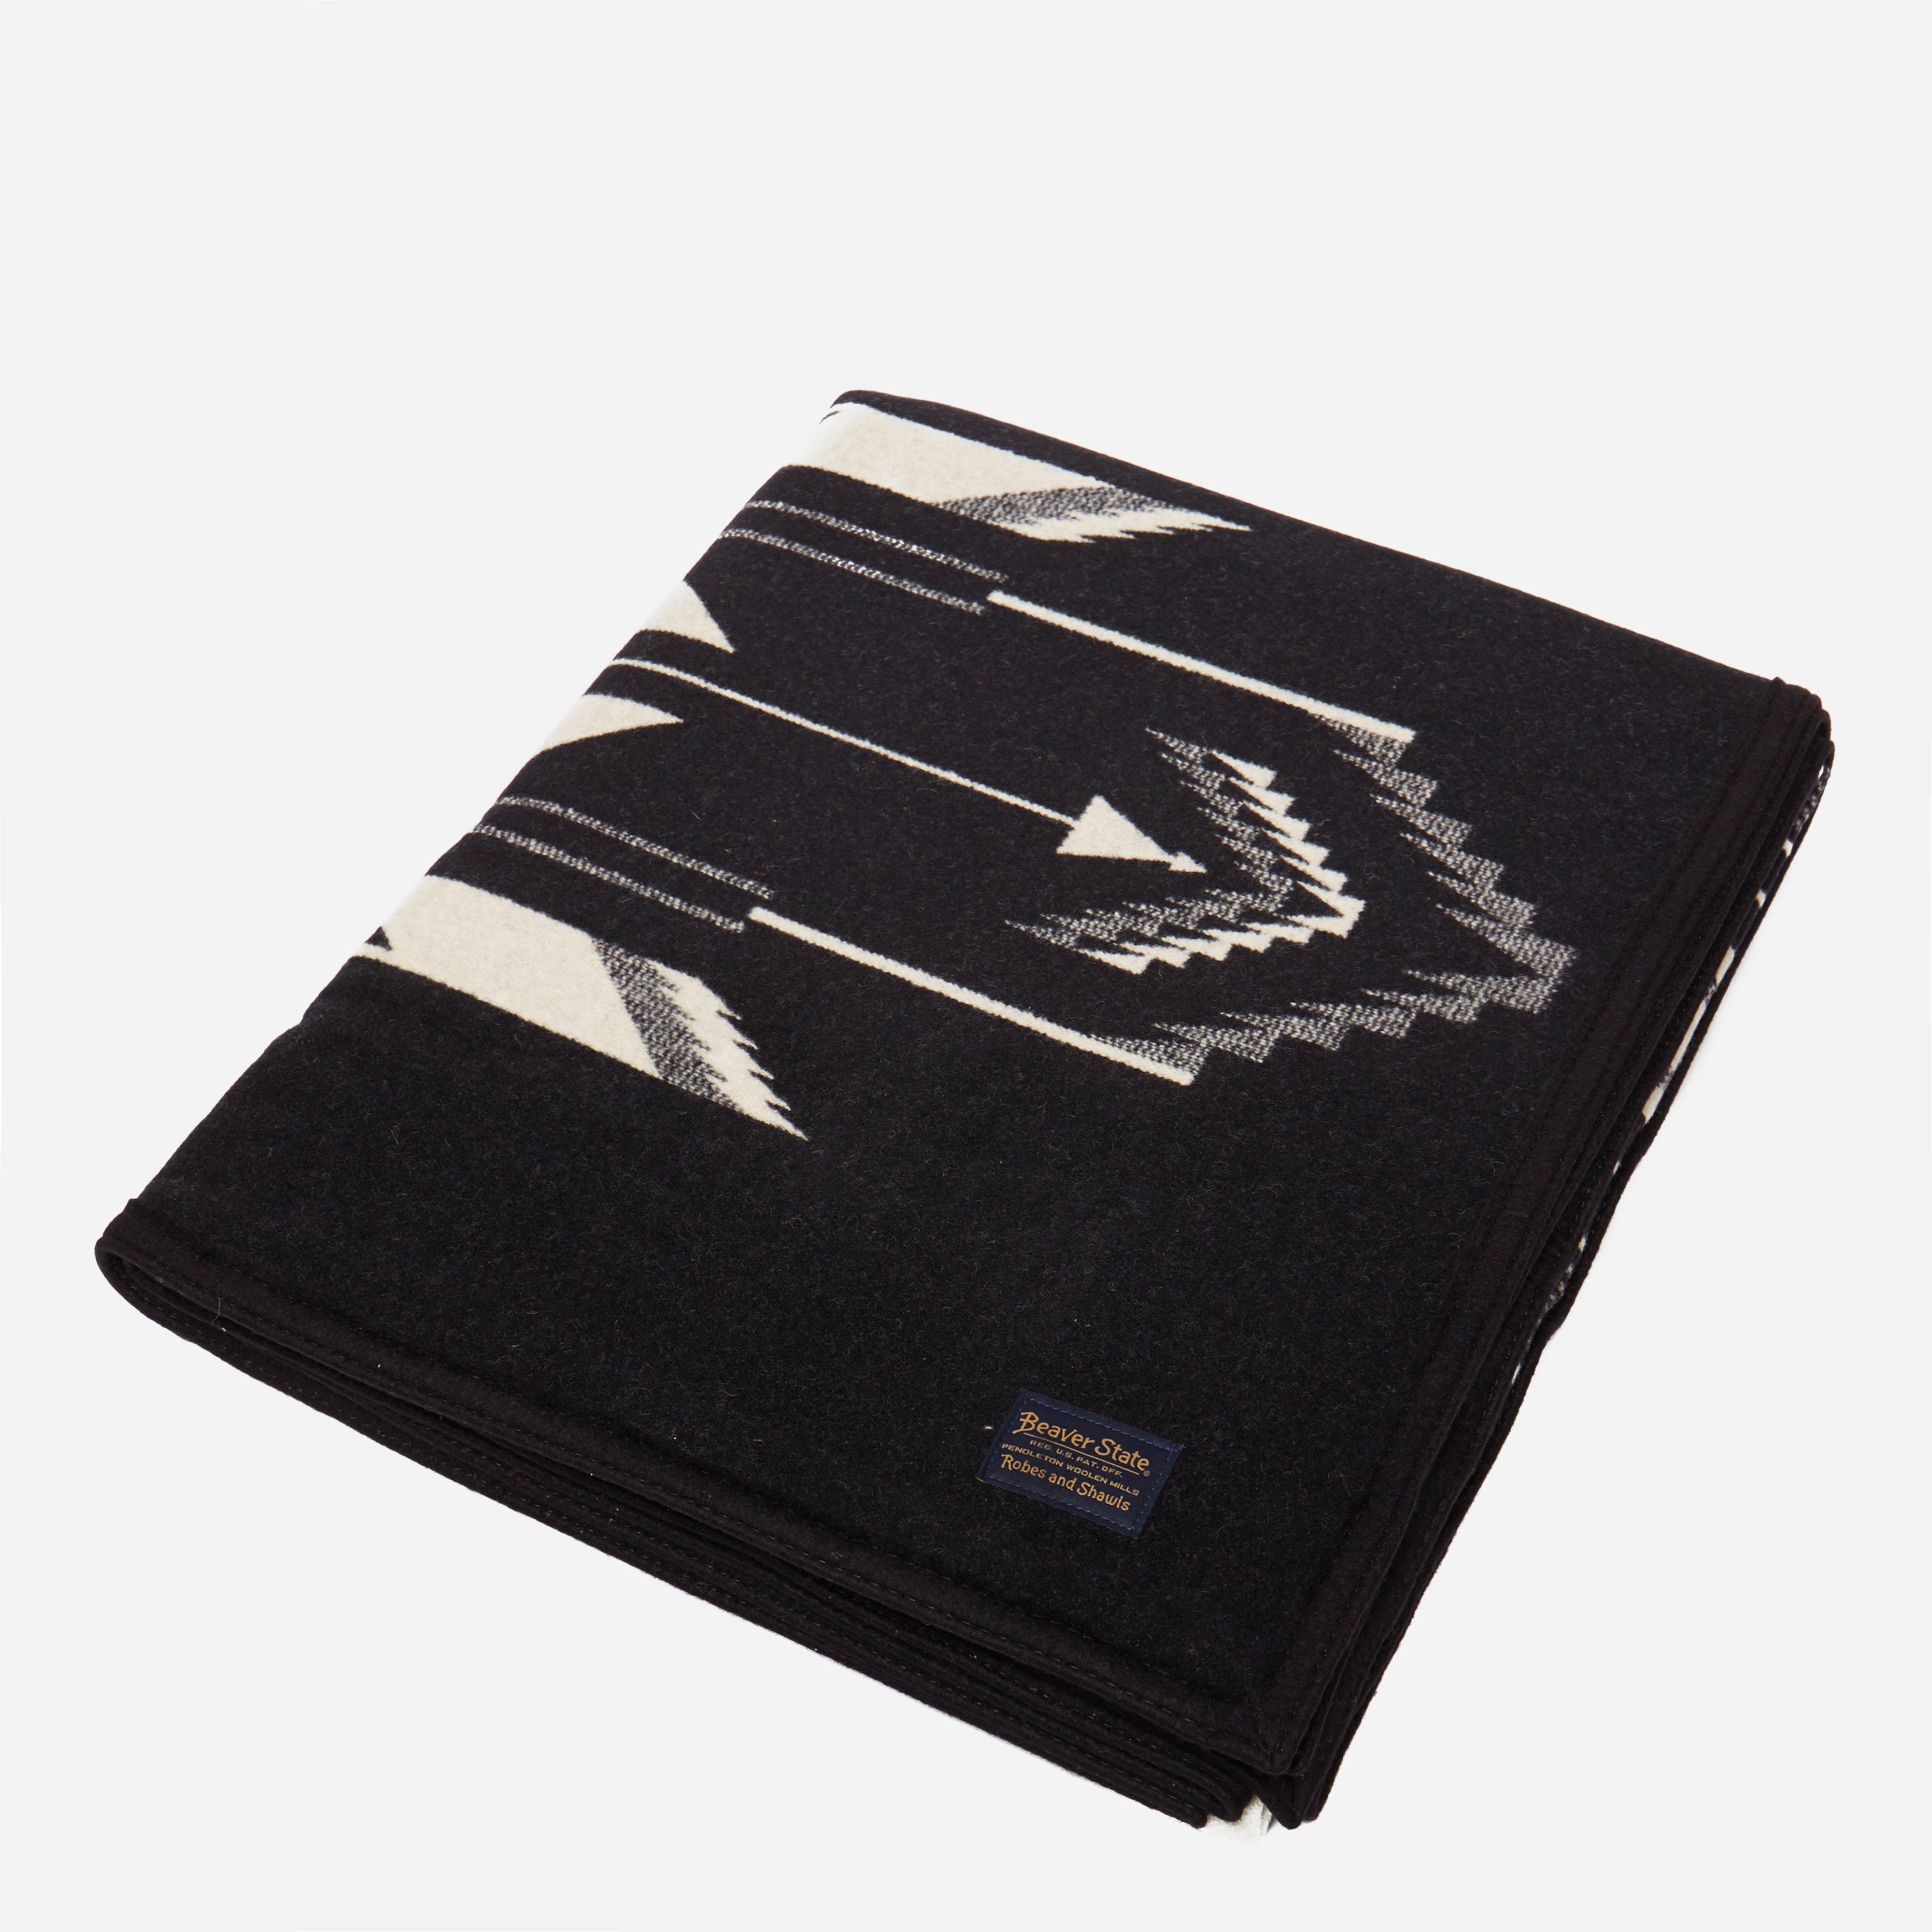 Pendleton Woolen Mills Tsi Mayoh Camp Blanket